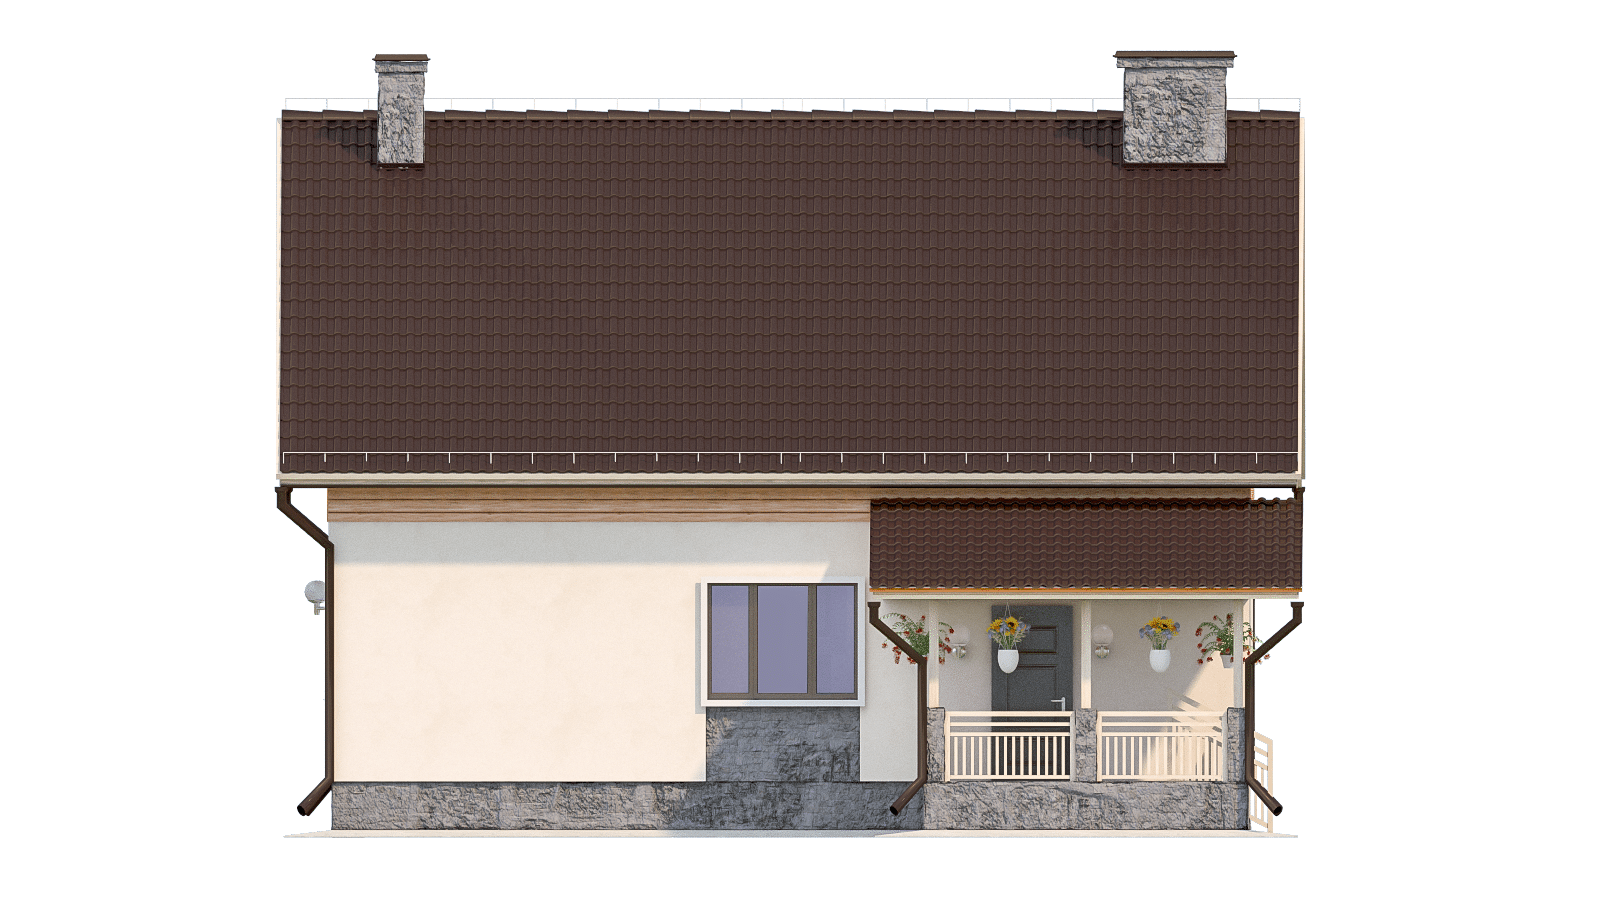 Фасад мансардного дома с террасой «КМ-93» - справа